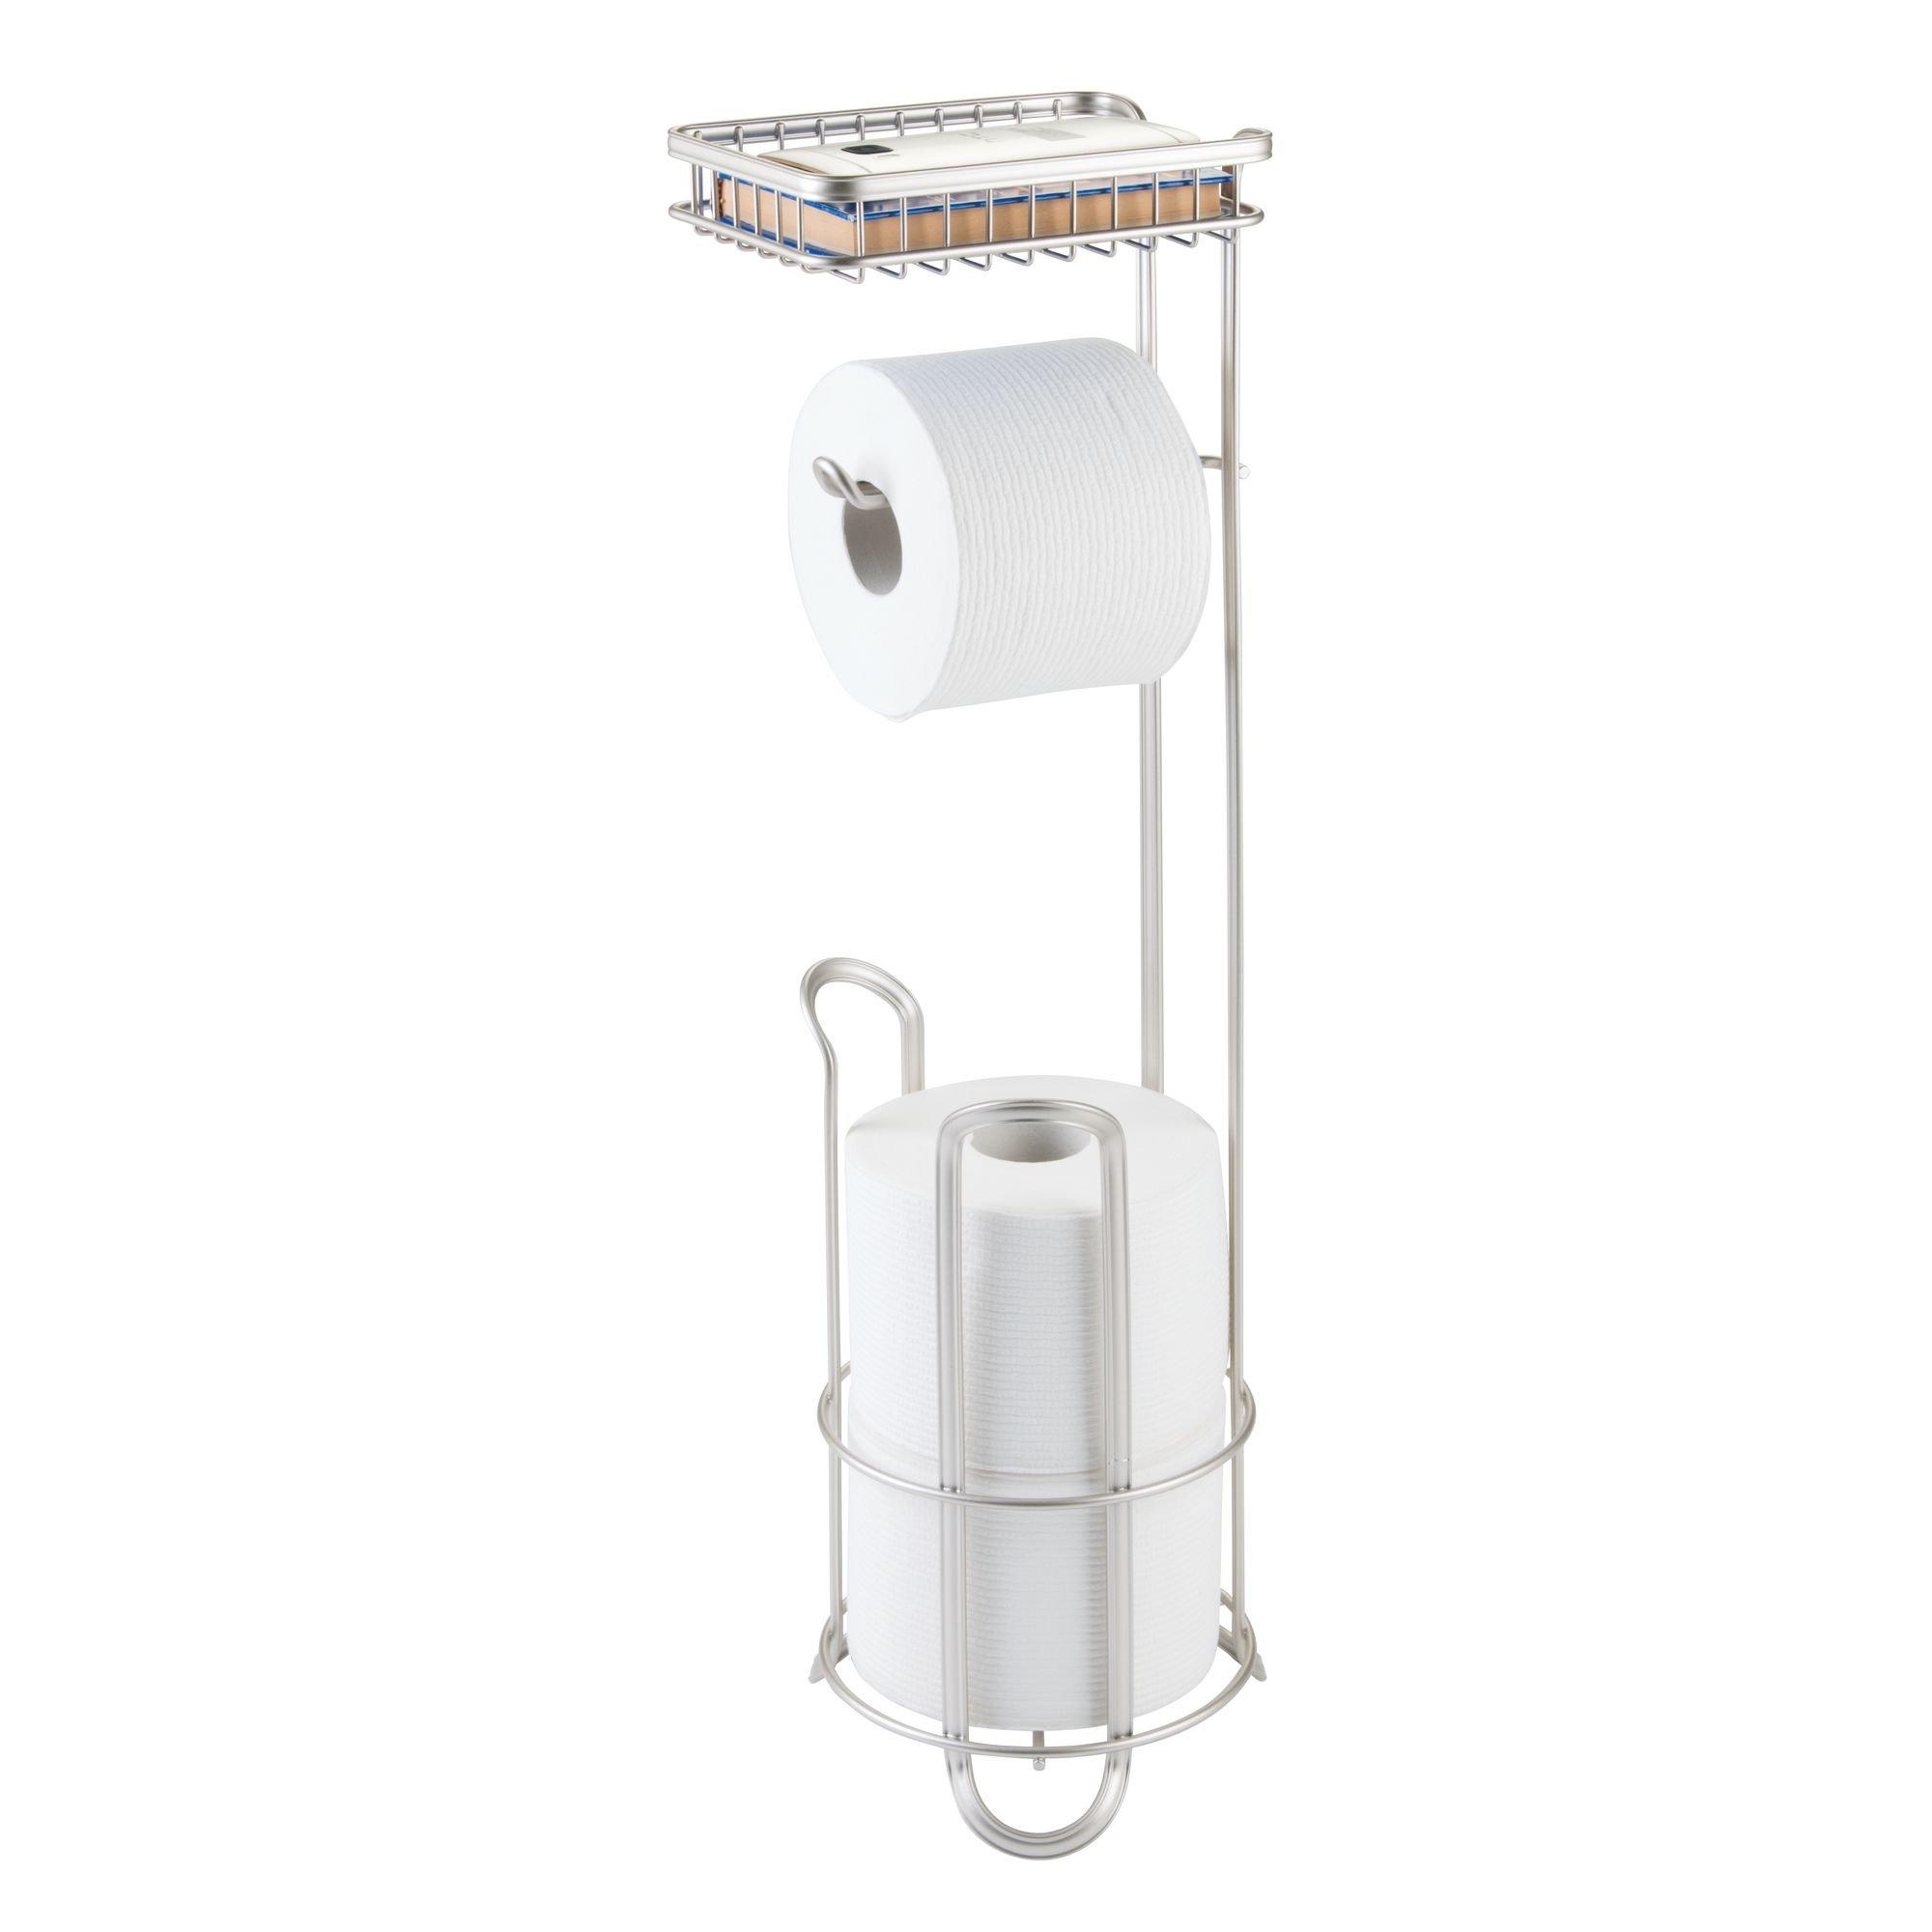 mDesign Free Standing Toilet Paper Holder with Shelf for Bathroom - Matte Satin